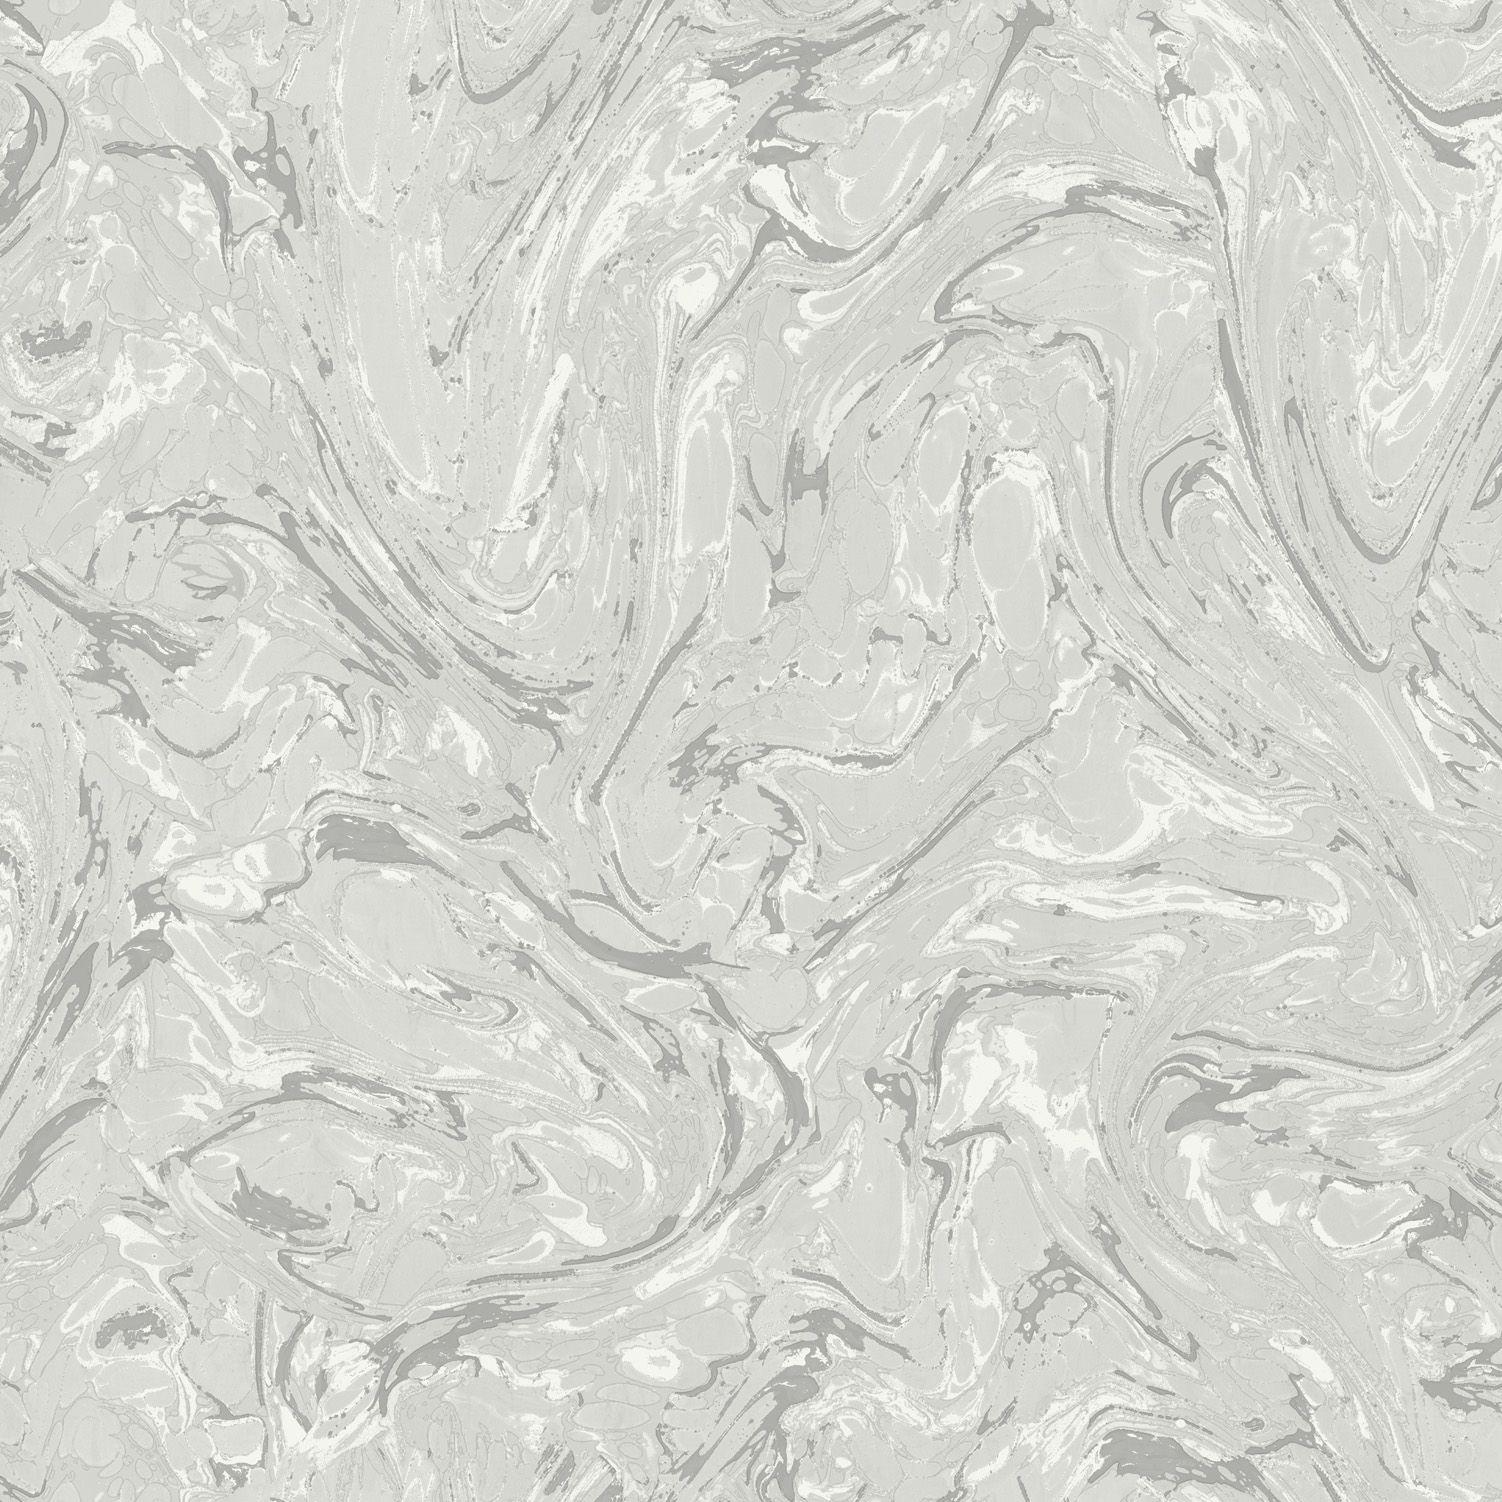 Download Wallpaper Marble Silver - f7109b9e6e561db2c3a5d10e81b1d67b  2018_113318.jpg